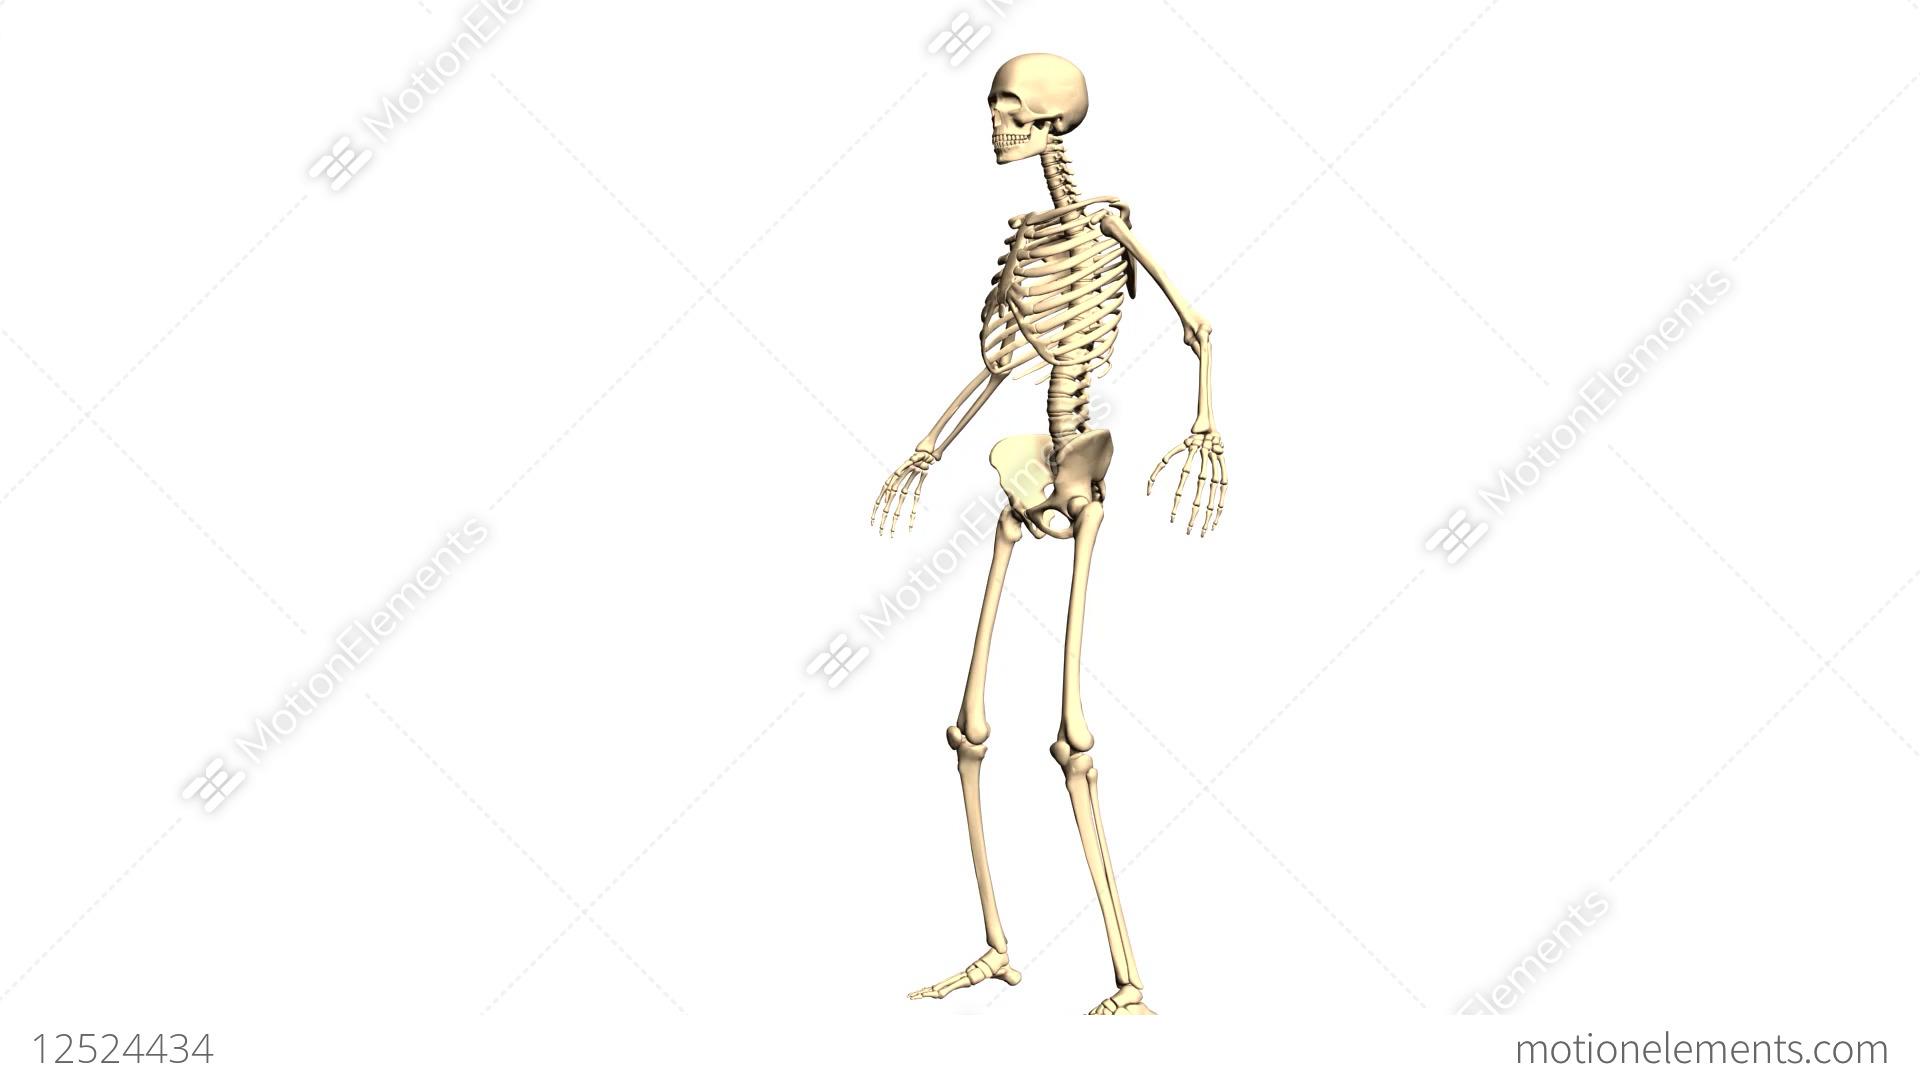 Animated 3d Anatomy Skeleton 3d Animation Time Lapse 3d Animation